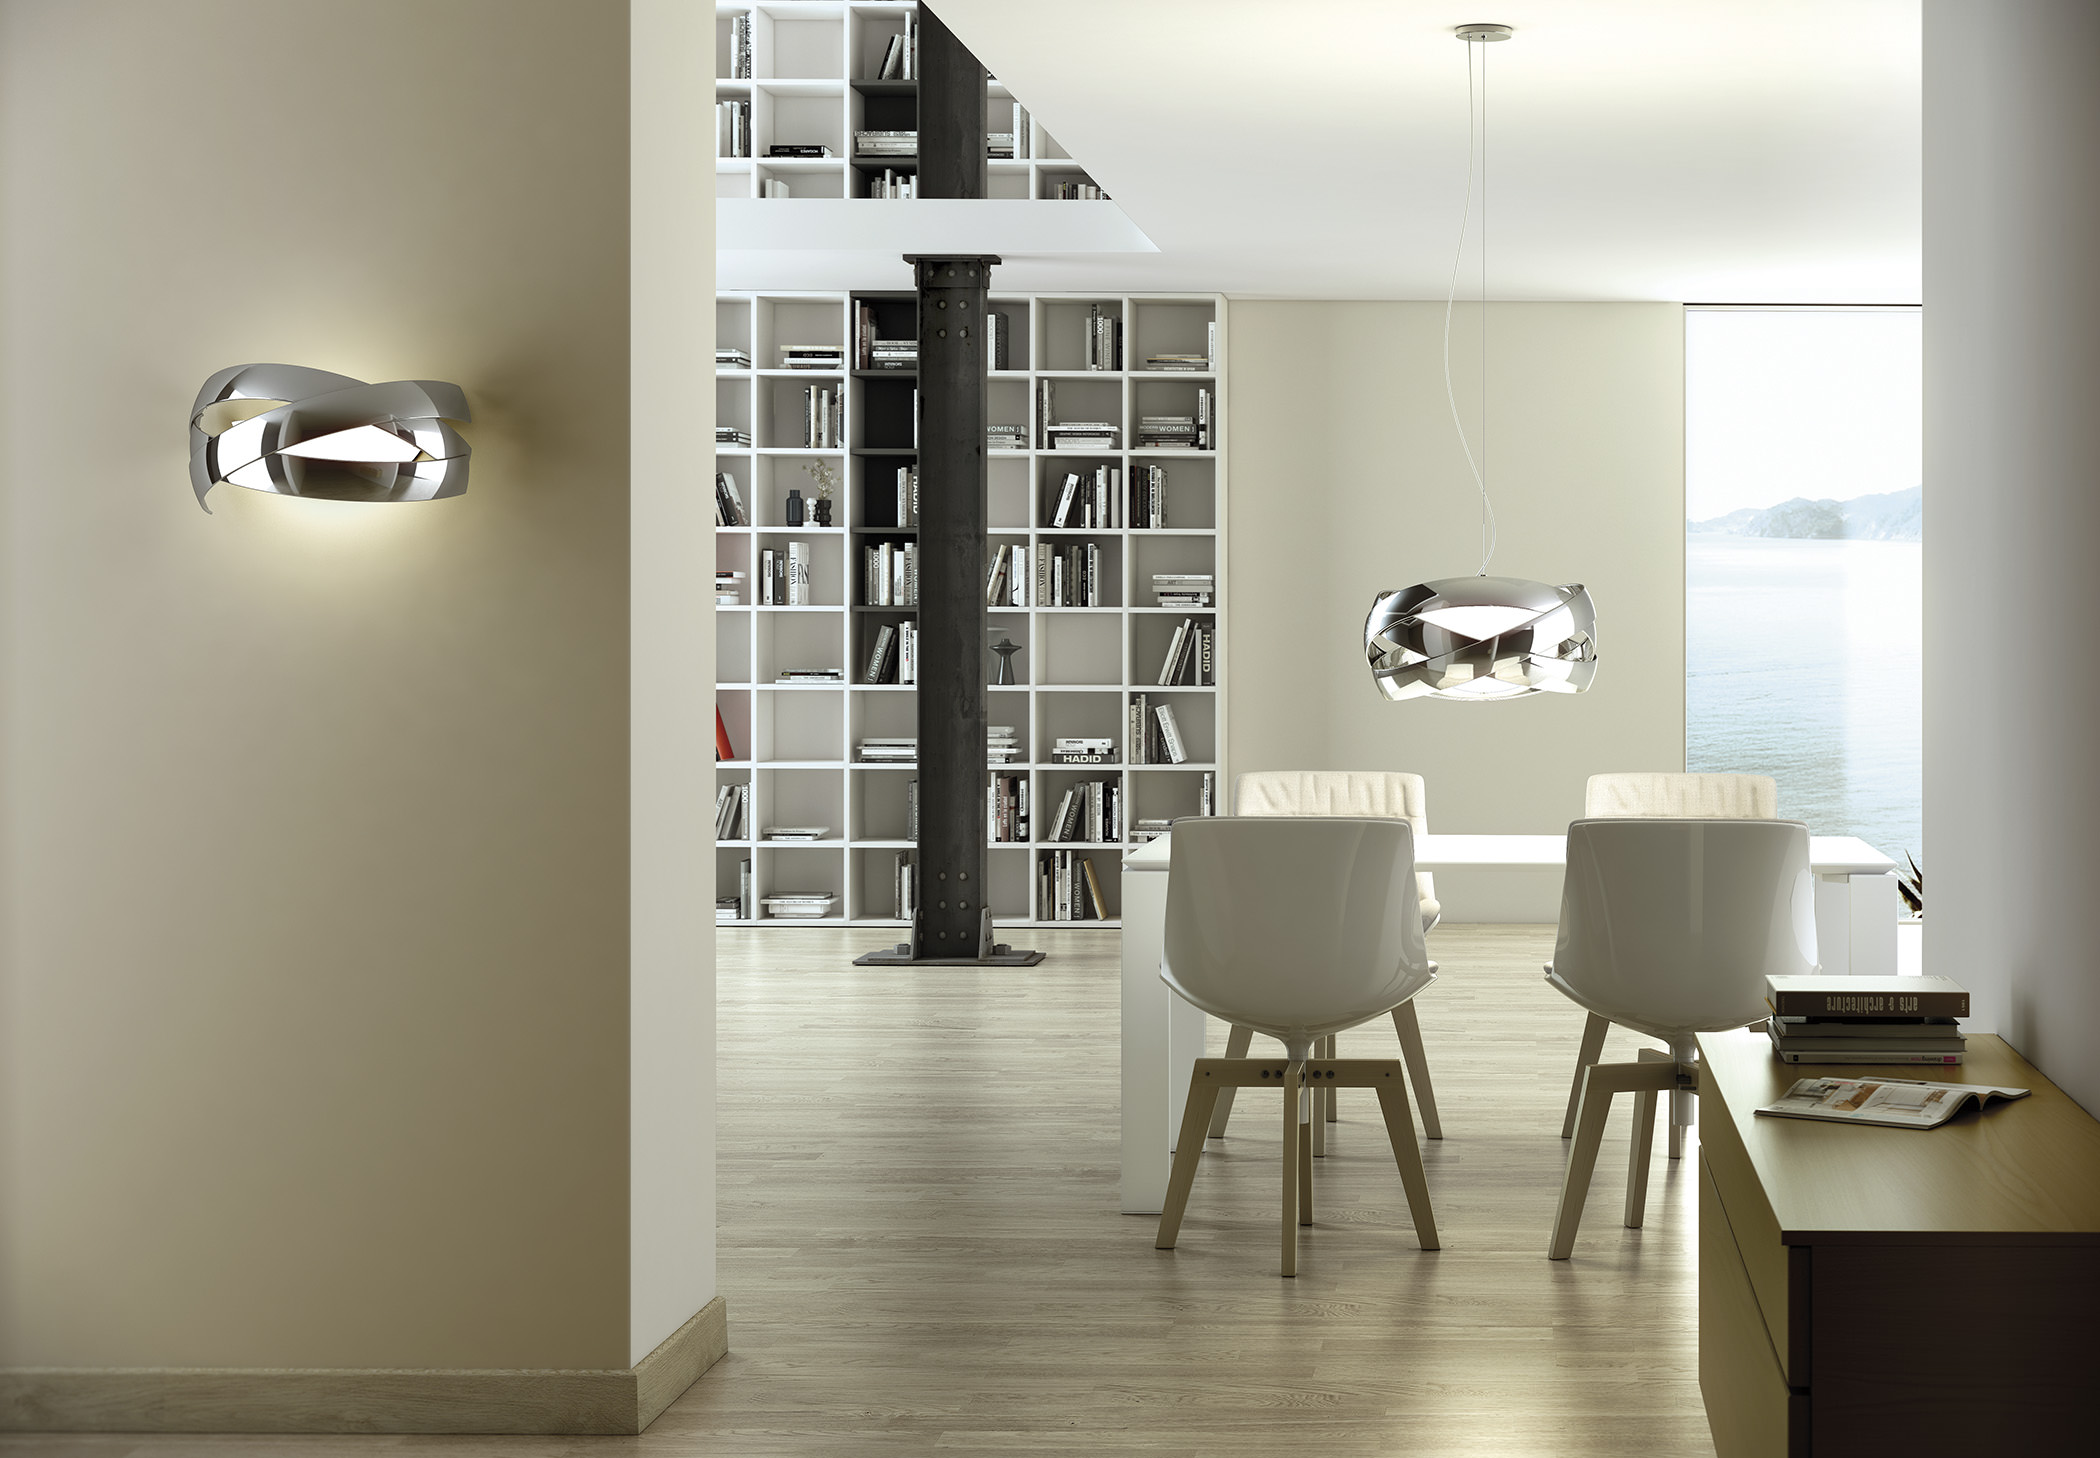 Siso A 2990 Wall Lamp Estiluz Image Ambient 01 1